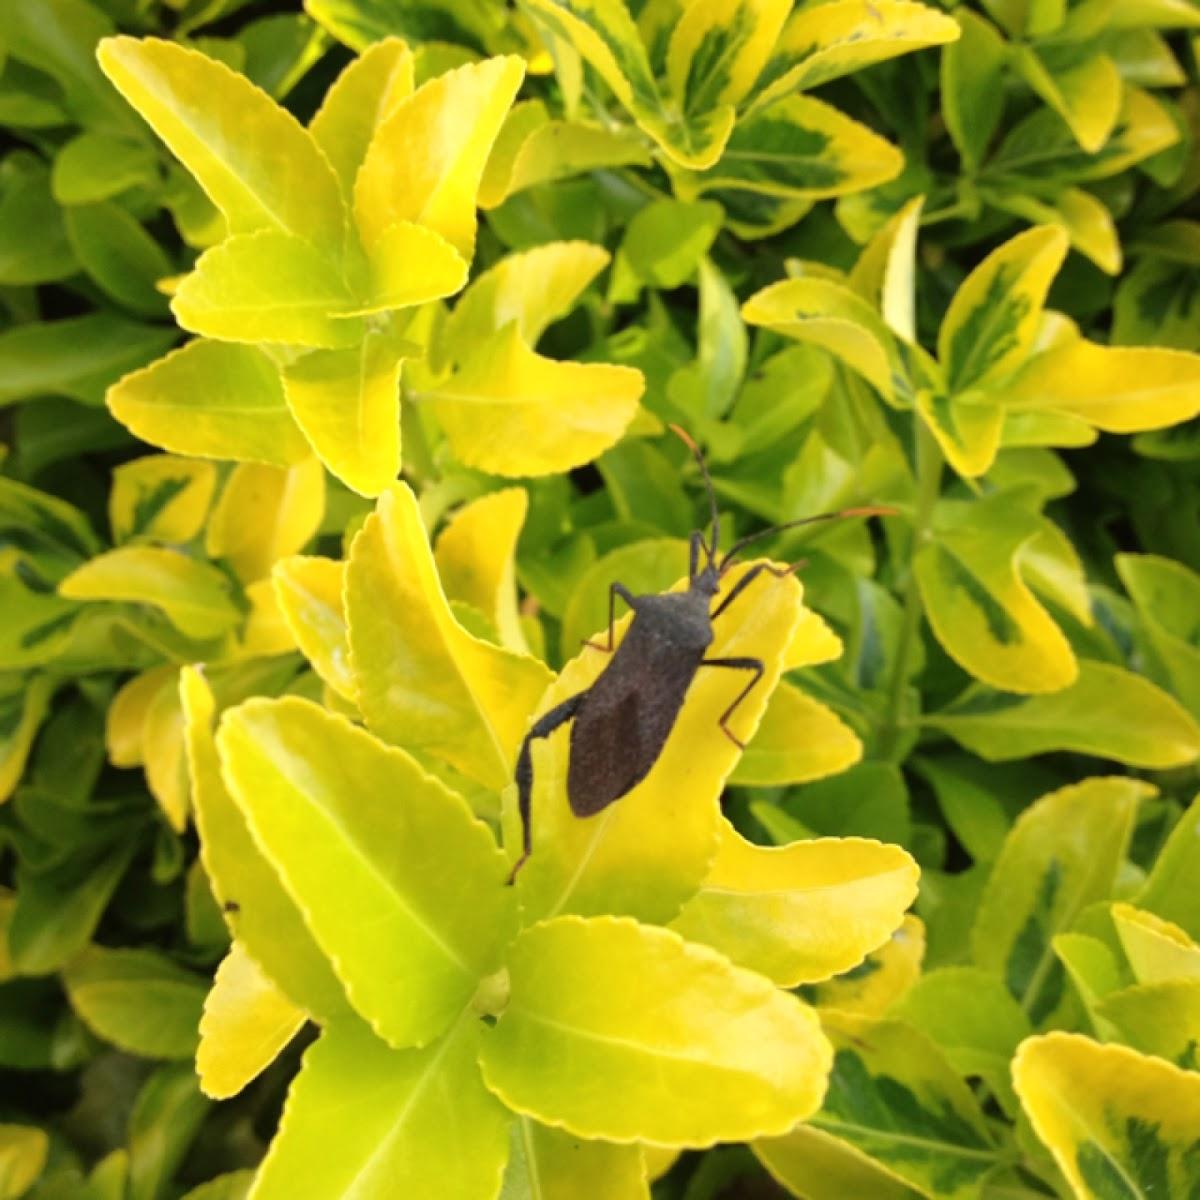 Leaf-footed bug